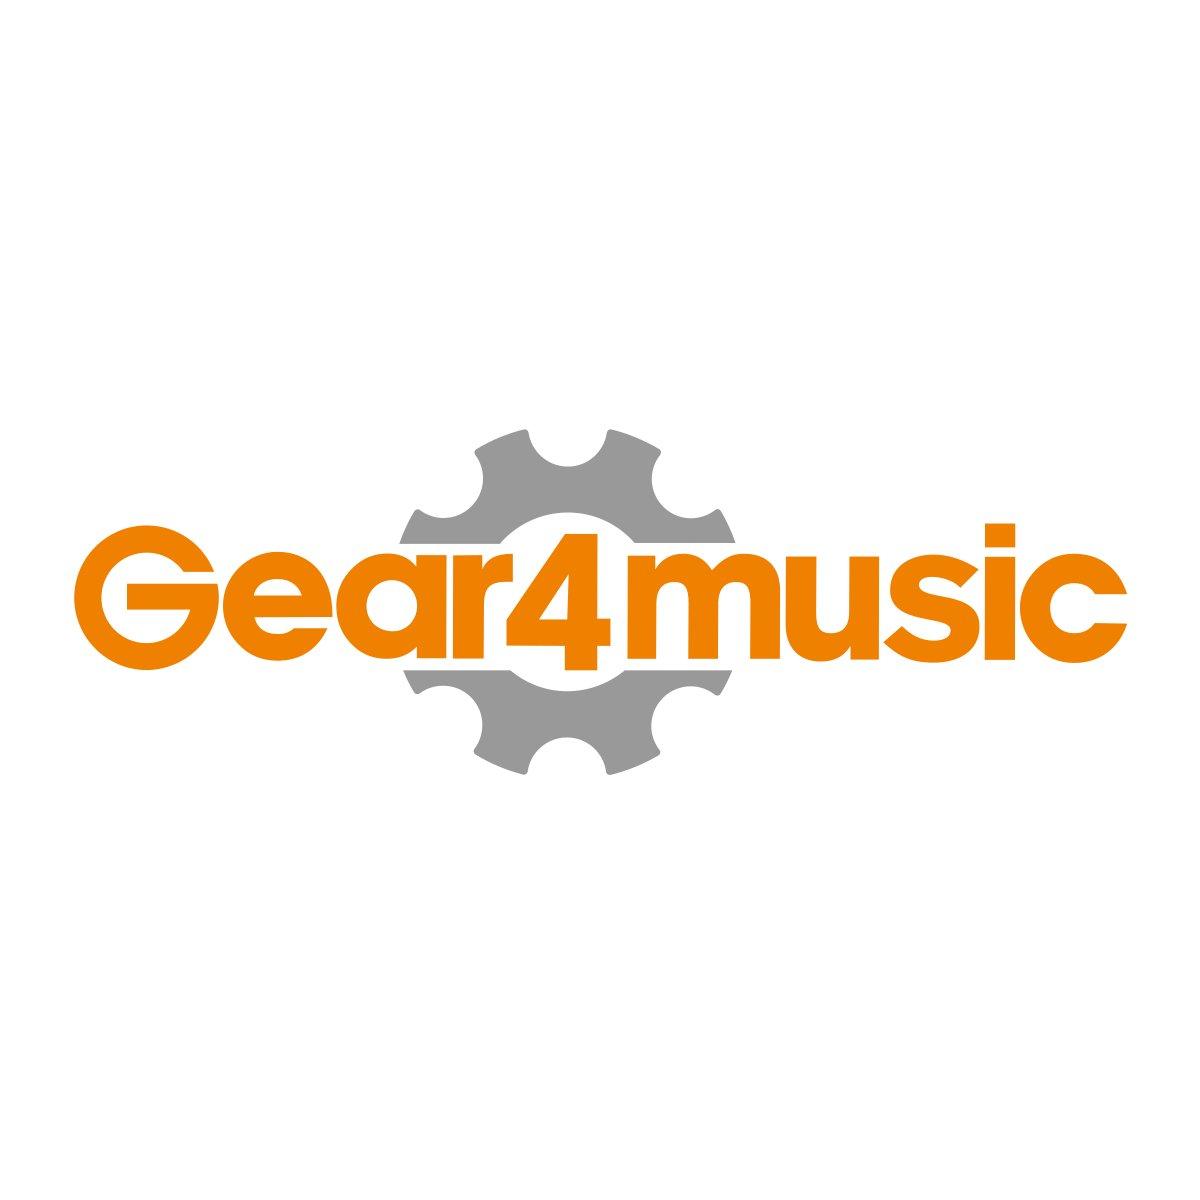 LA električna kitara za levičarje/ke od Gear4music, roza